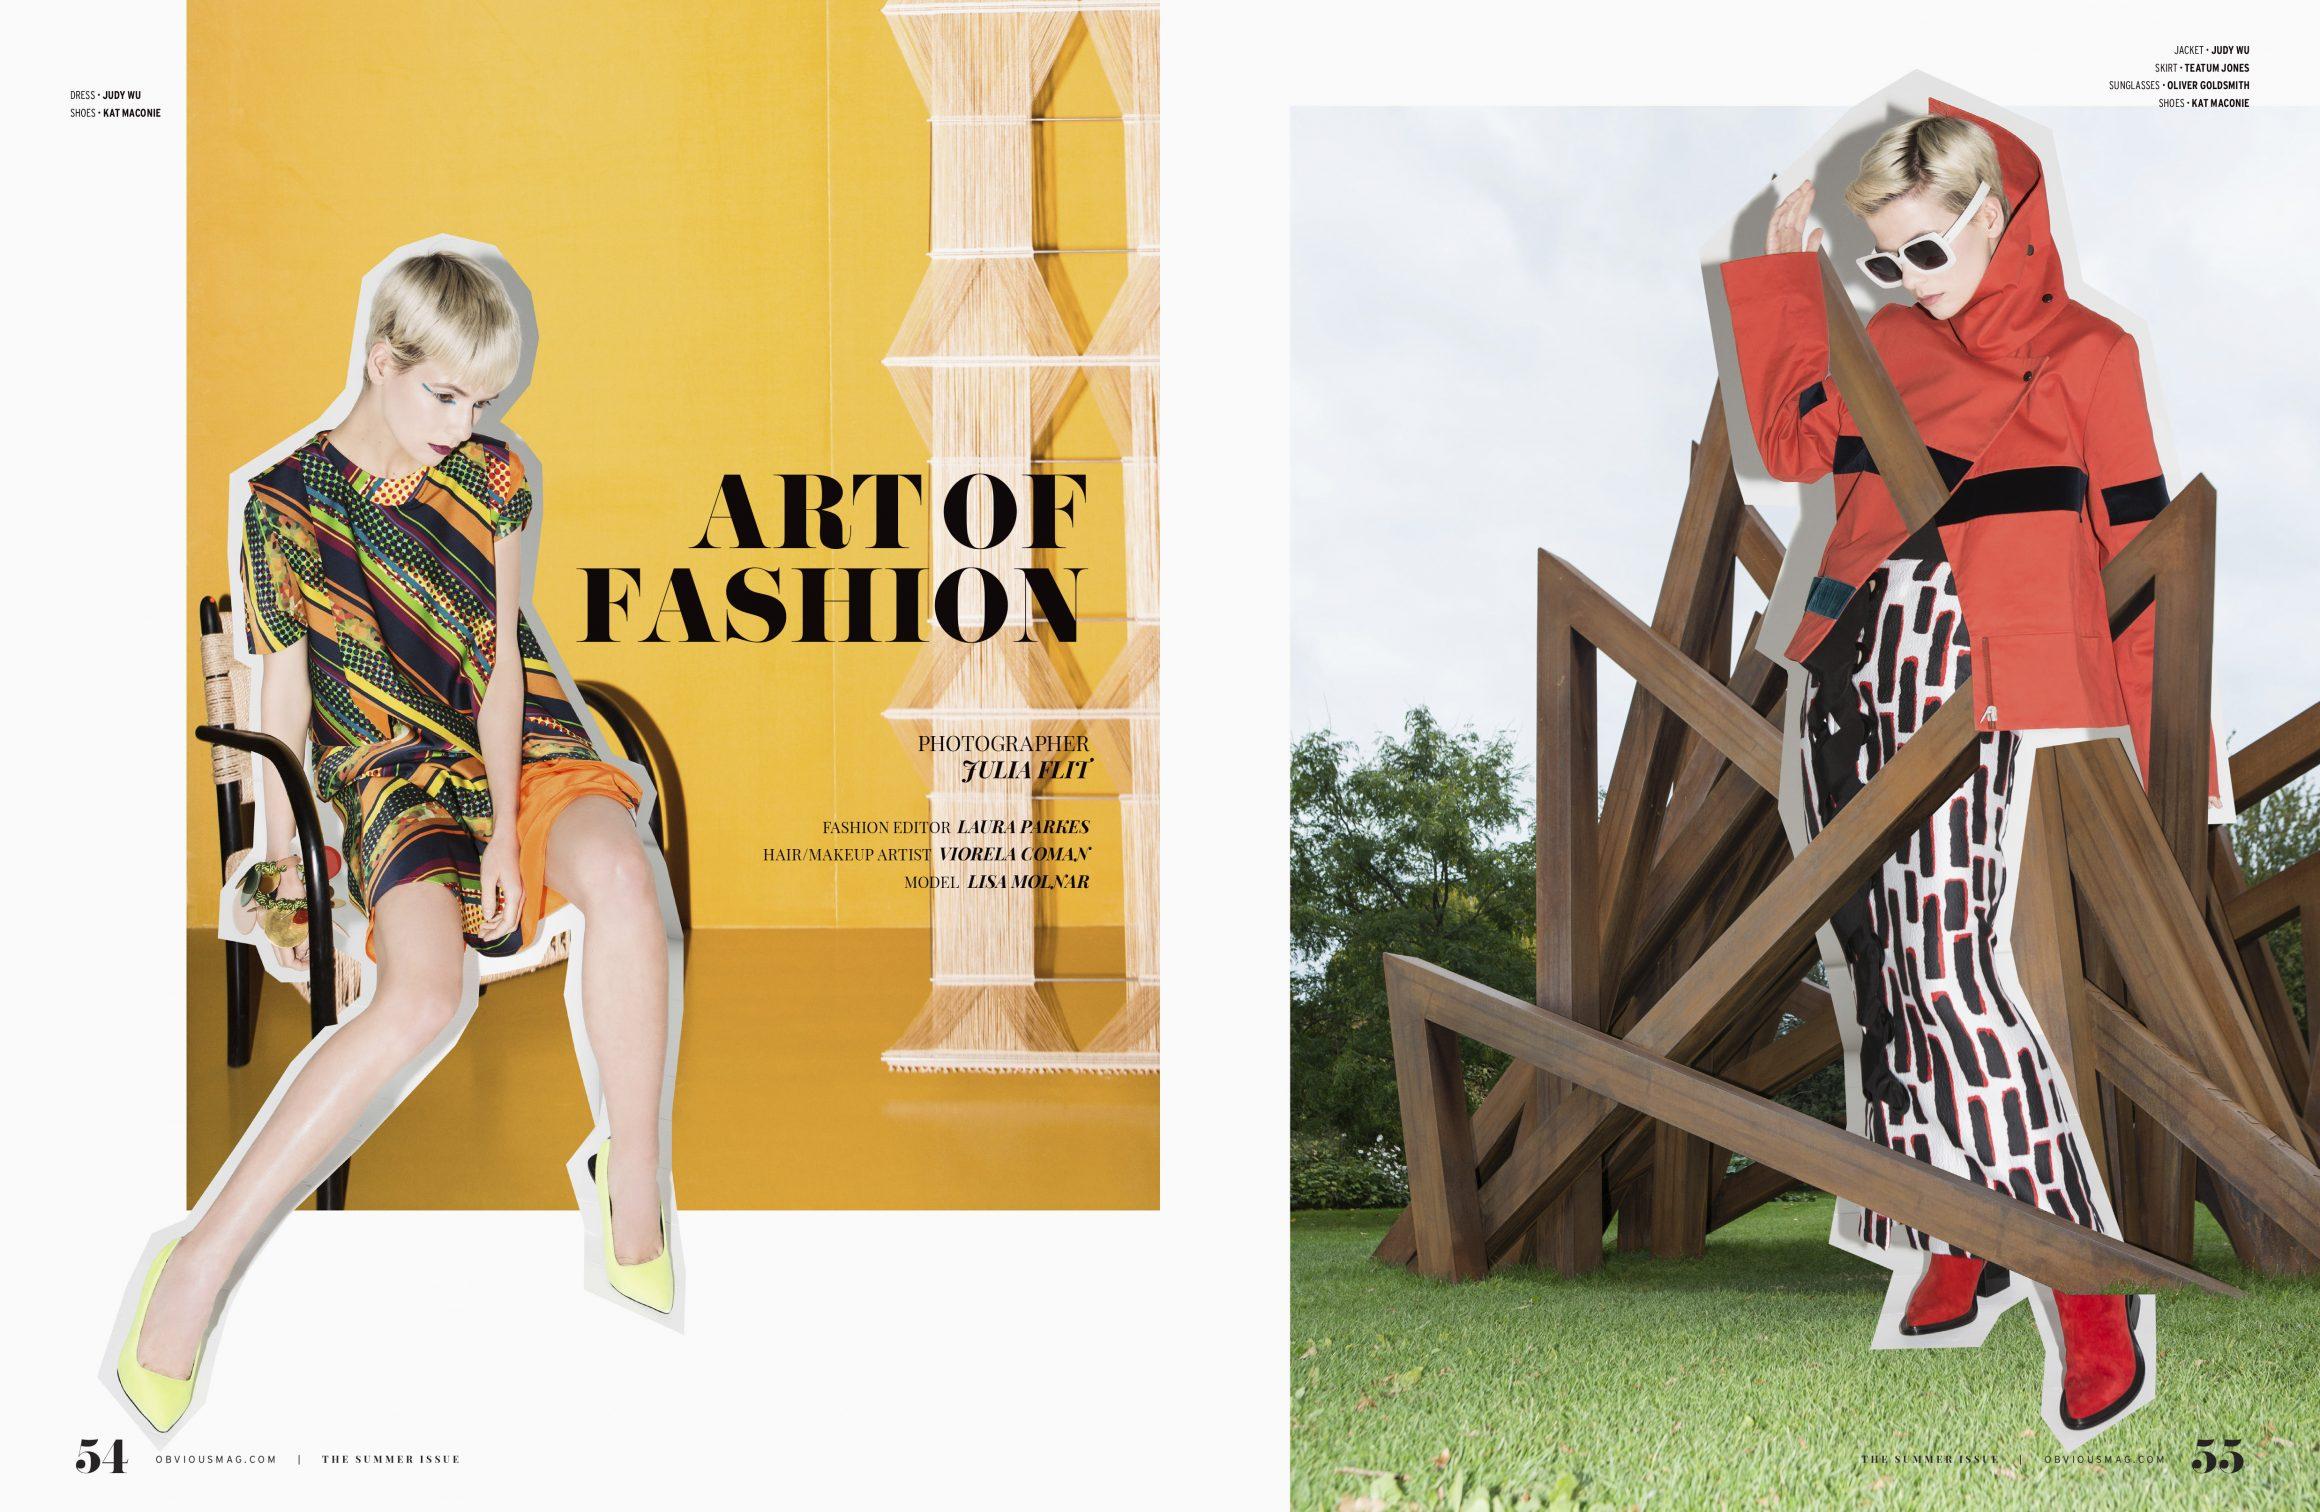 Art-Of-Fashion-1-2320x1512.jpg